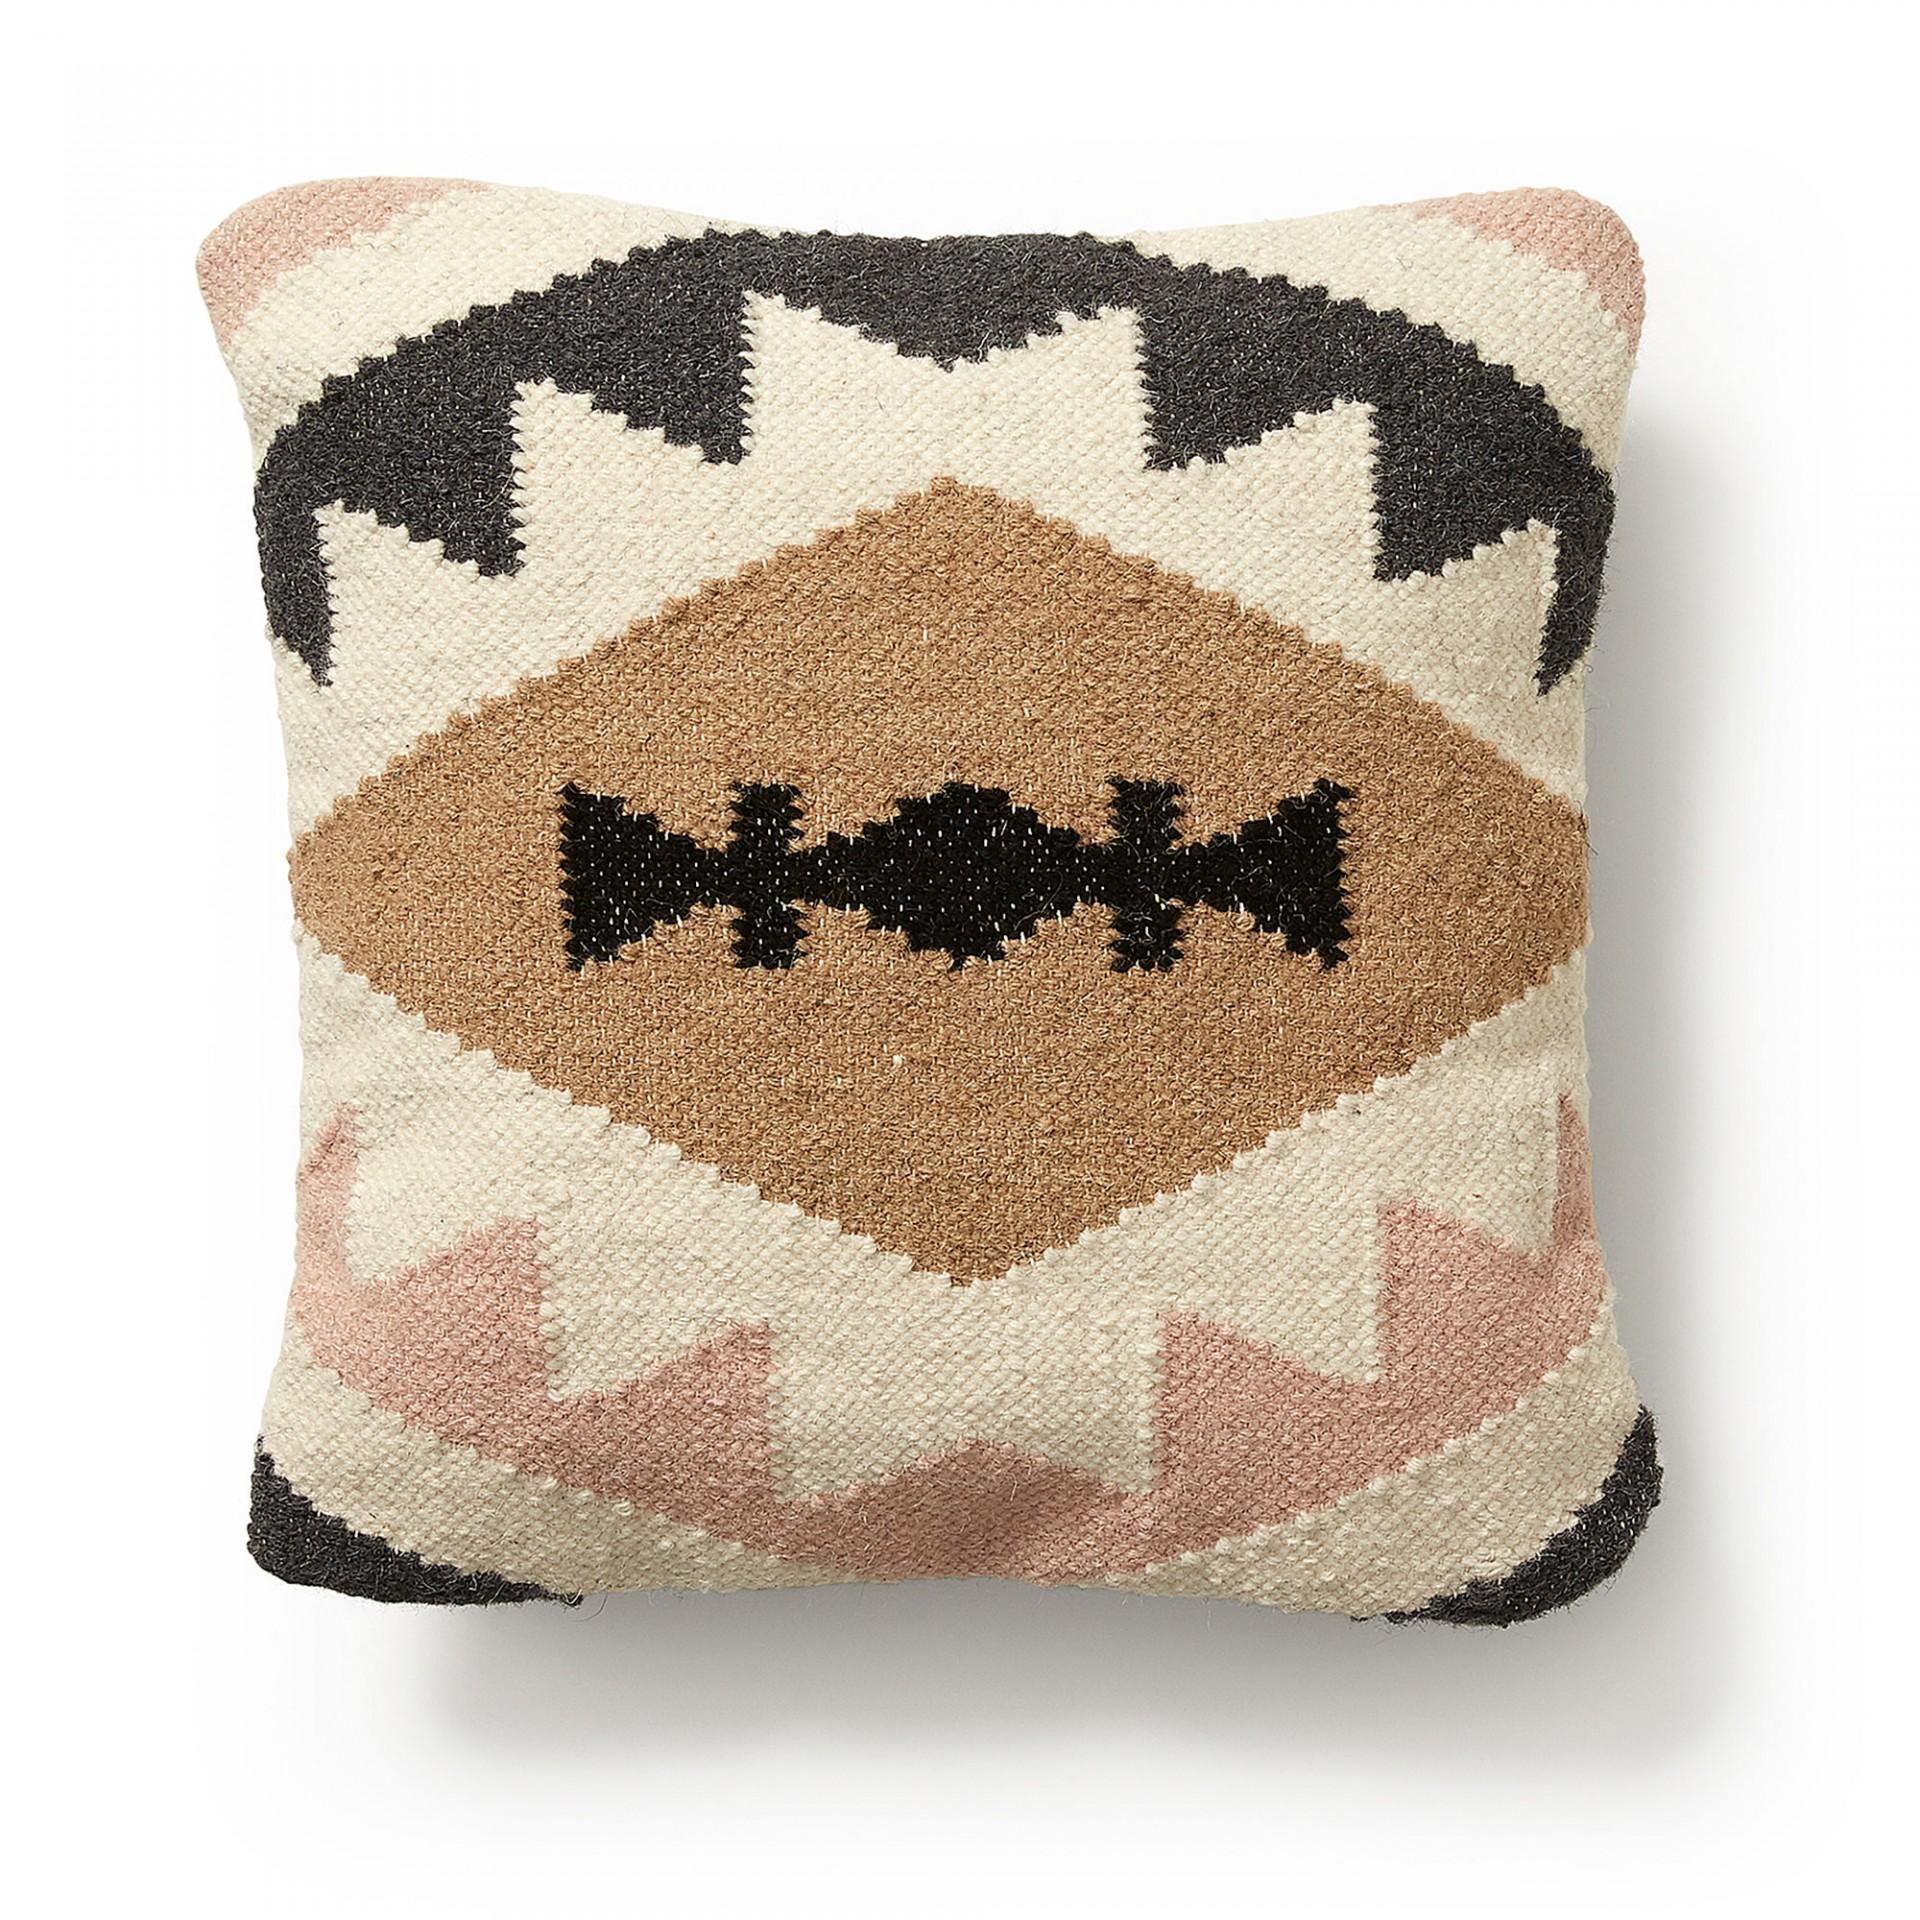 Capa de almofada Galler, algodão, multicolor, 45x45